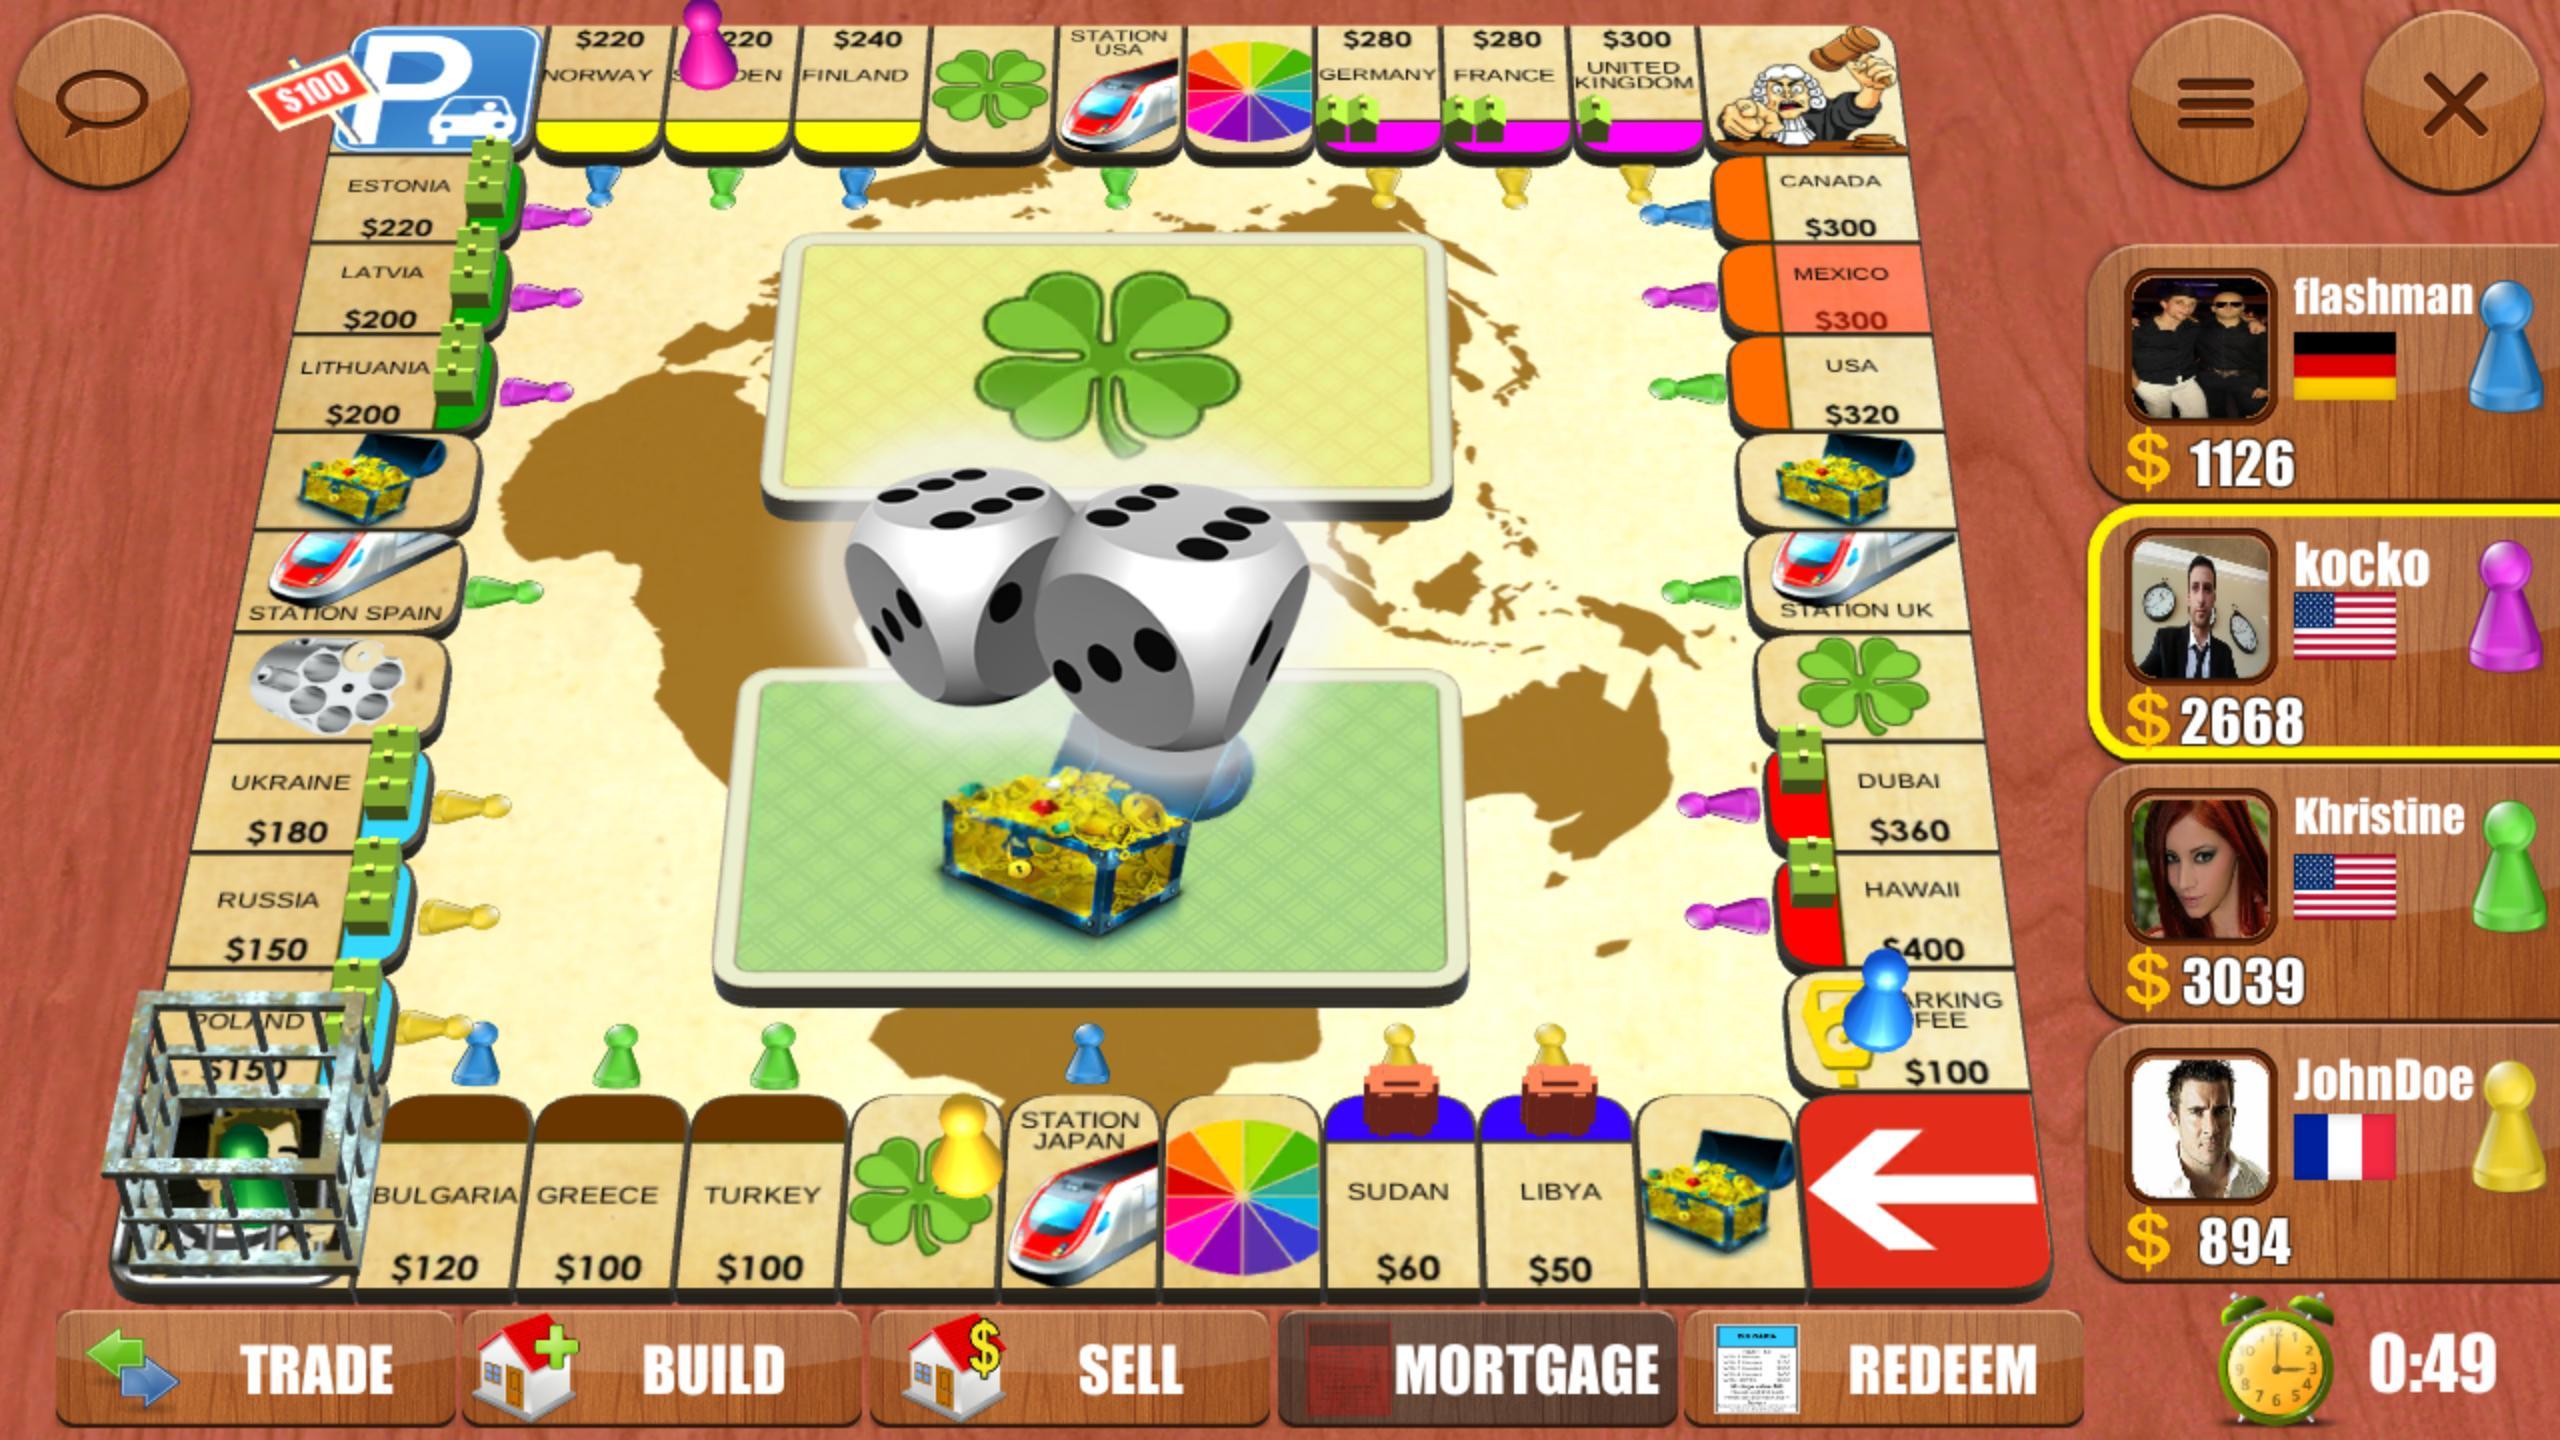 Rento Dice Board Game Online 5.1.9 Screenshot 17